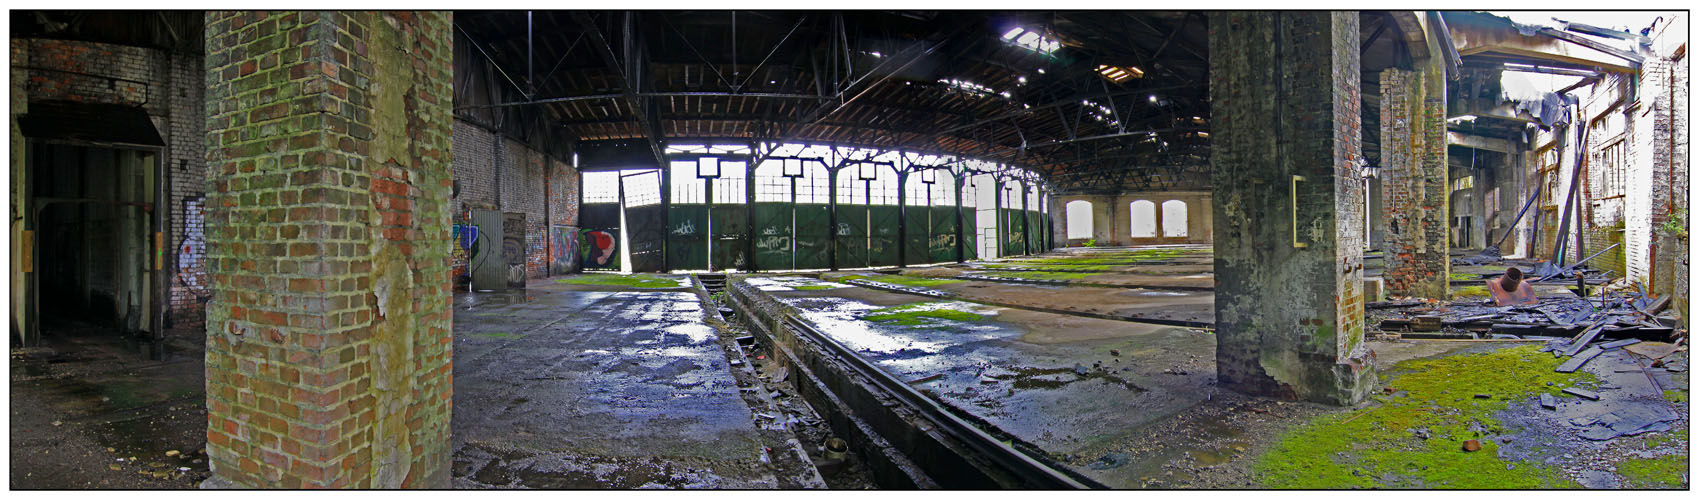 Lokschuppen Bahnbetriebswerk Dillenburg